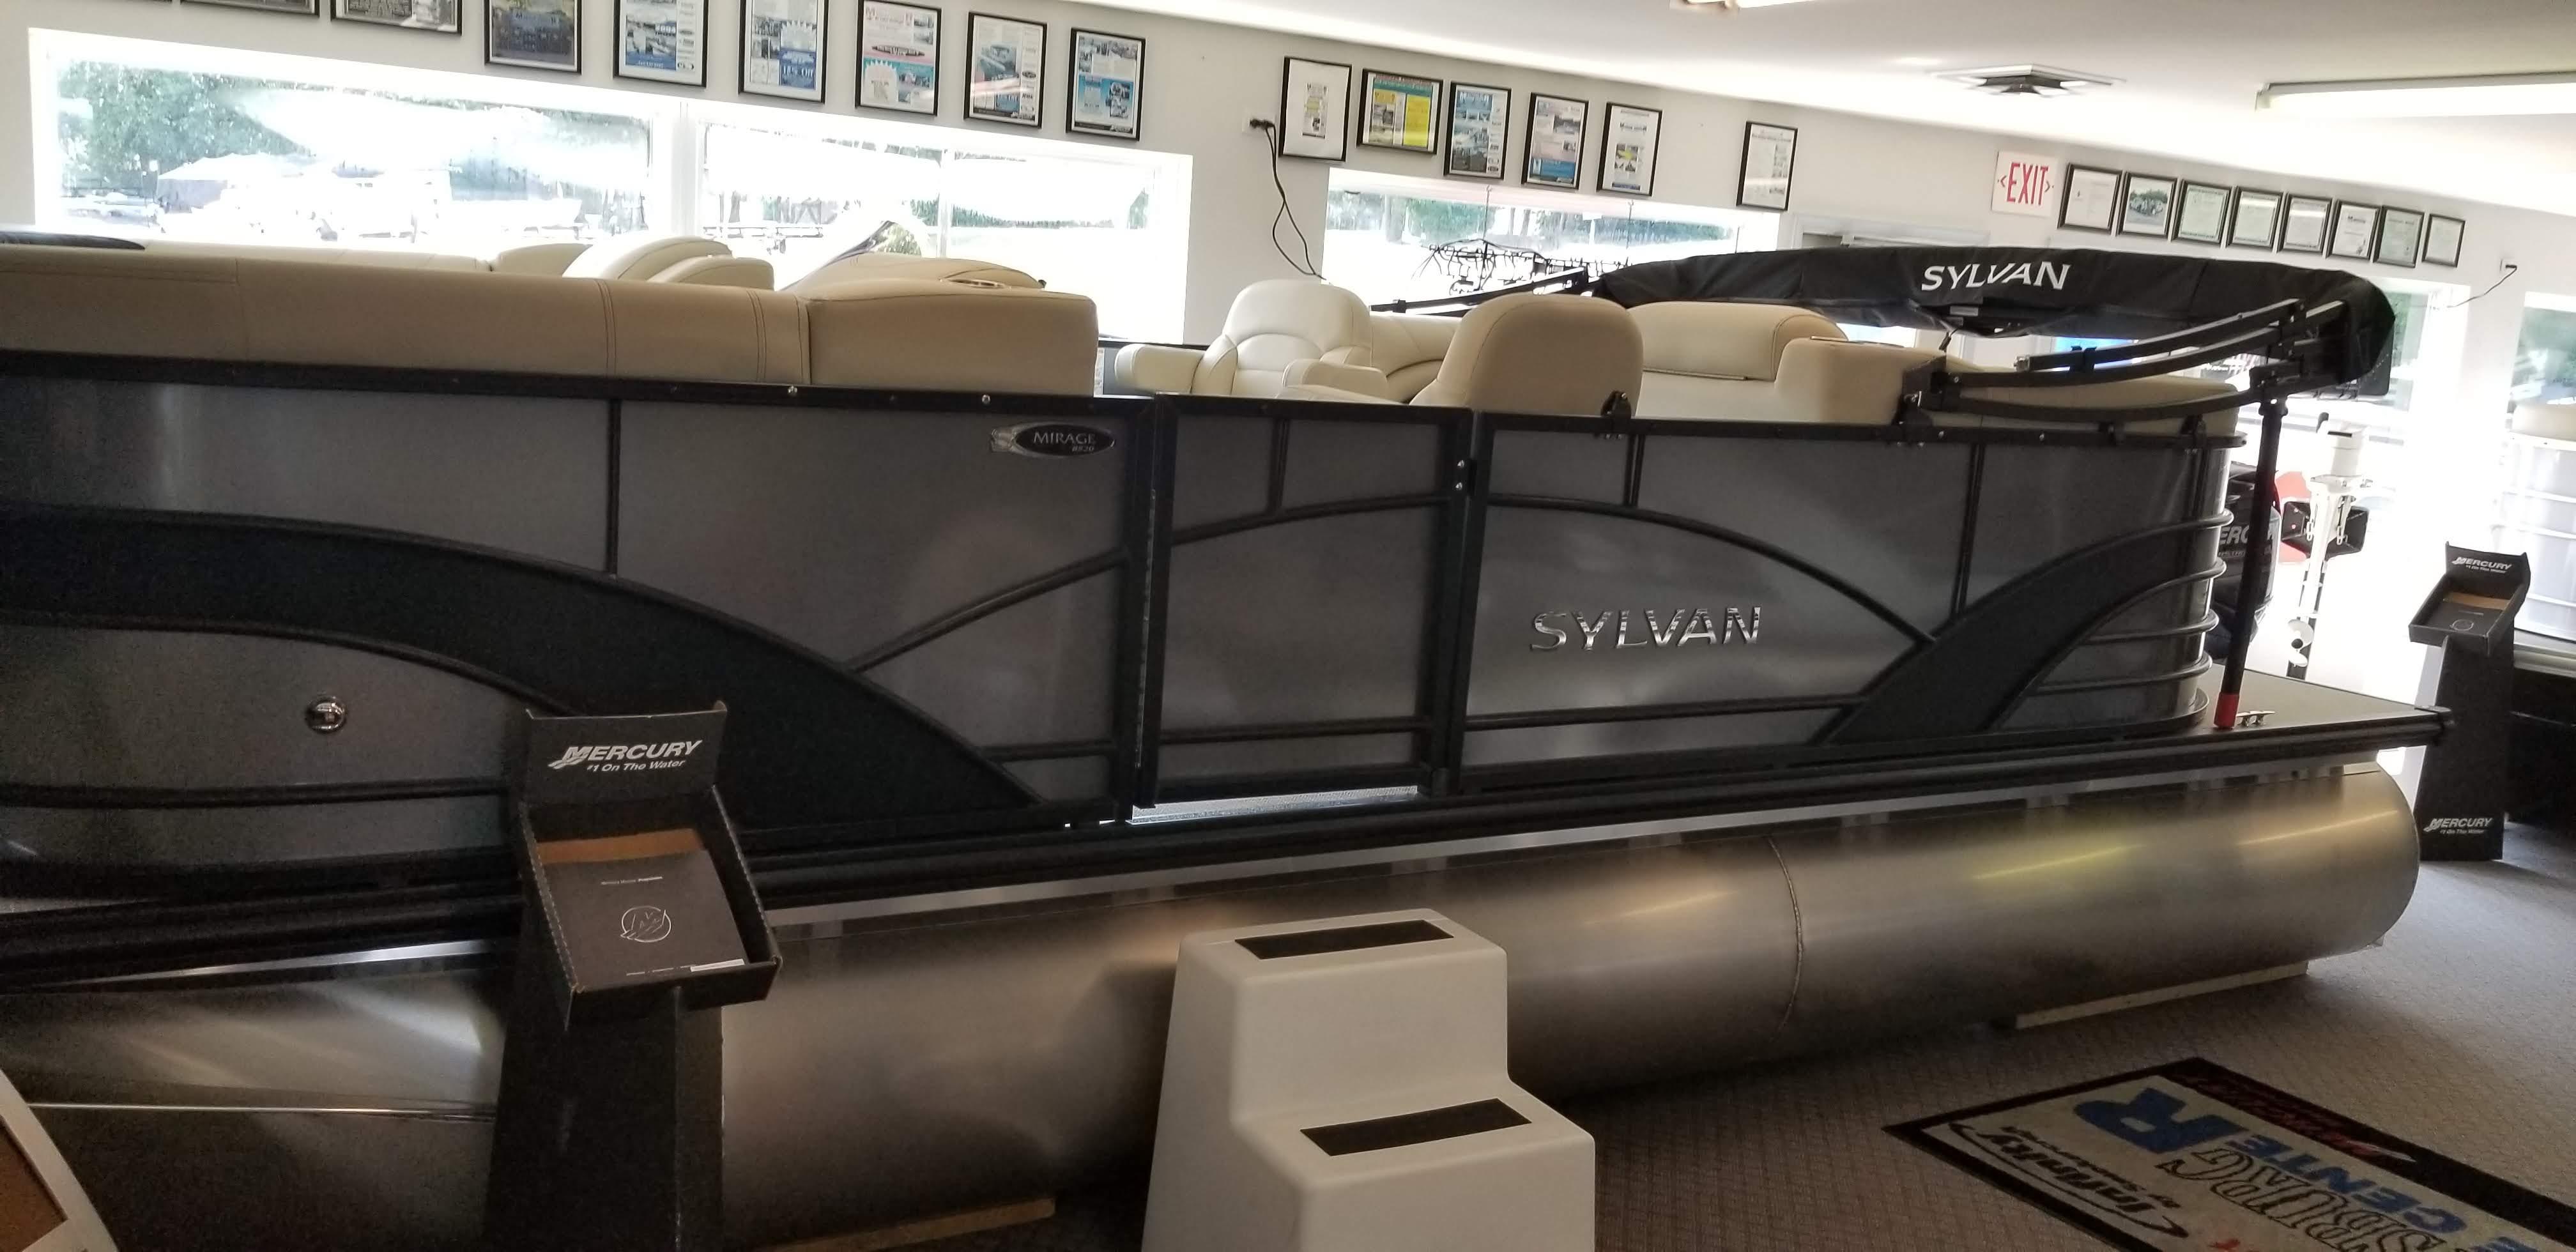 2019 SYLVAN MIRAGE 8520 LZ